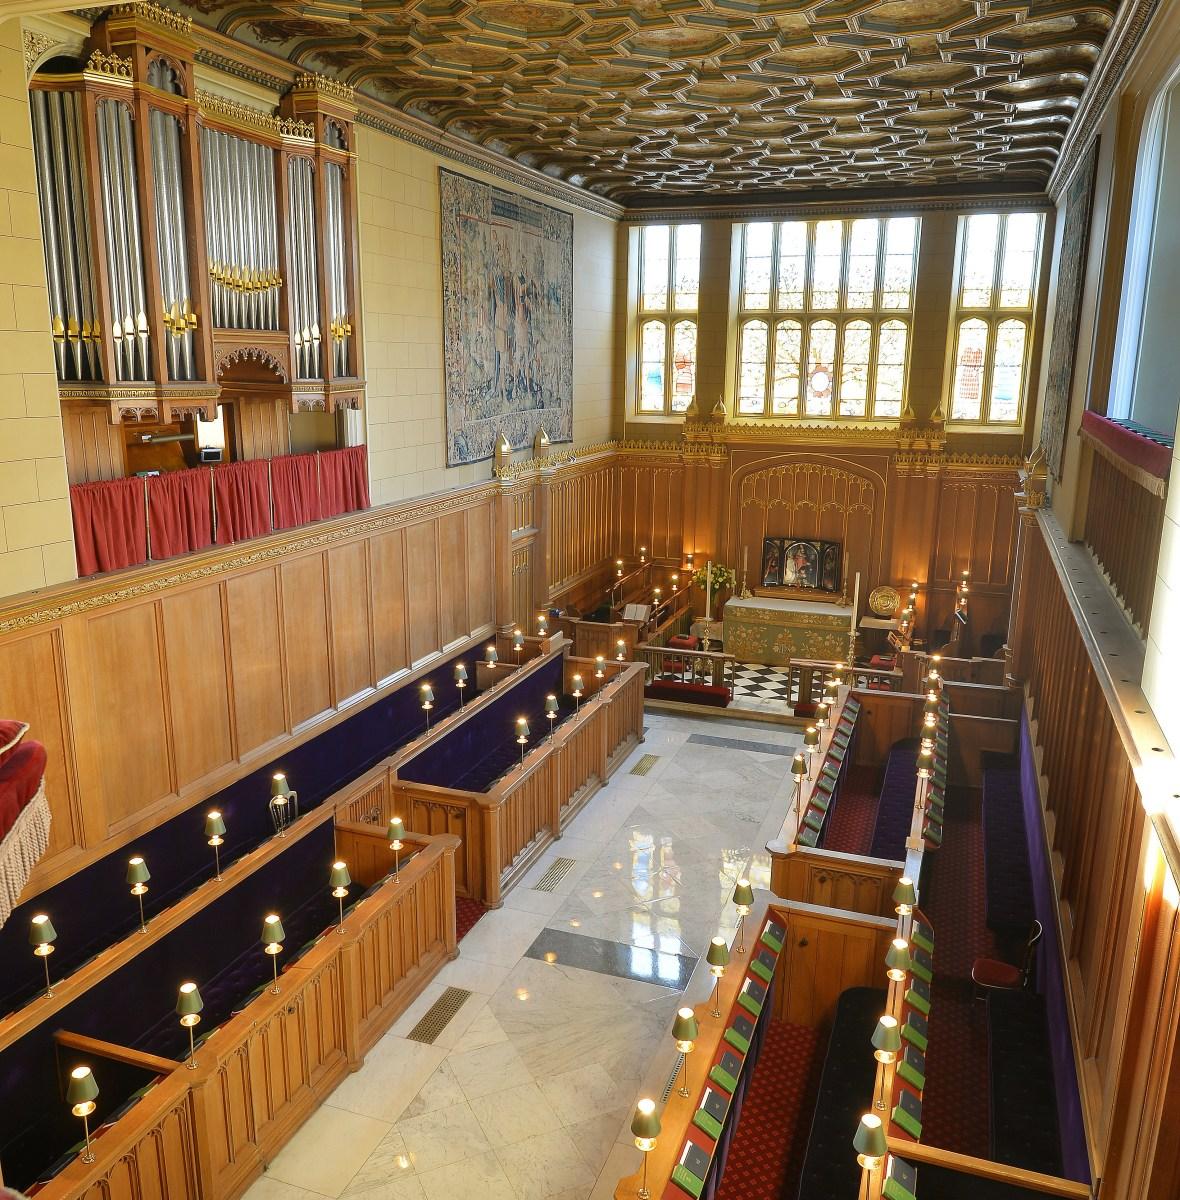 royal chapel at st. james's palace getty images